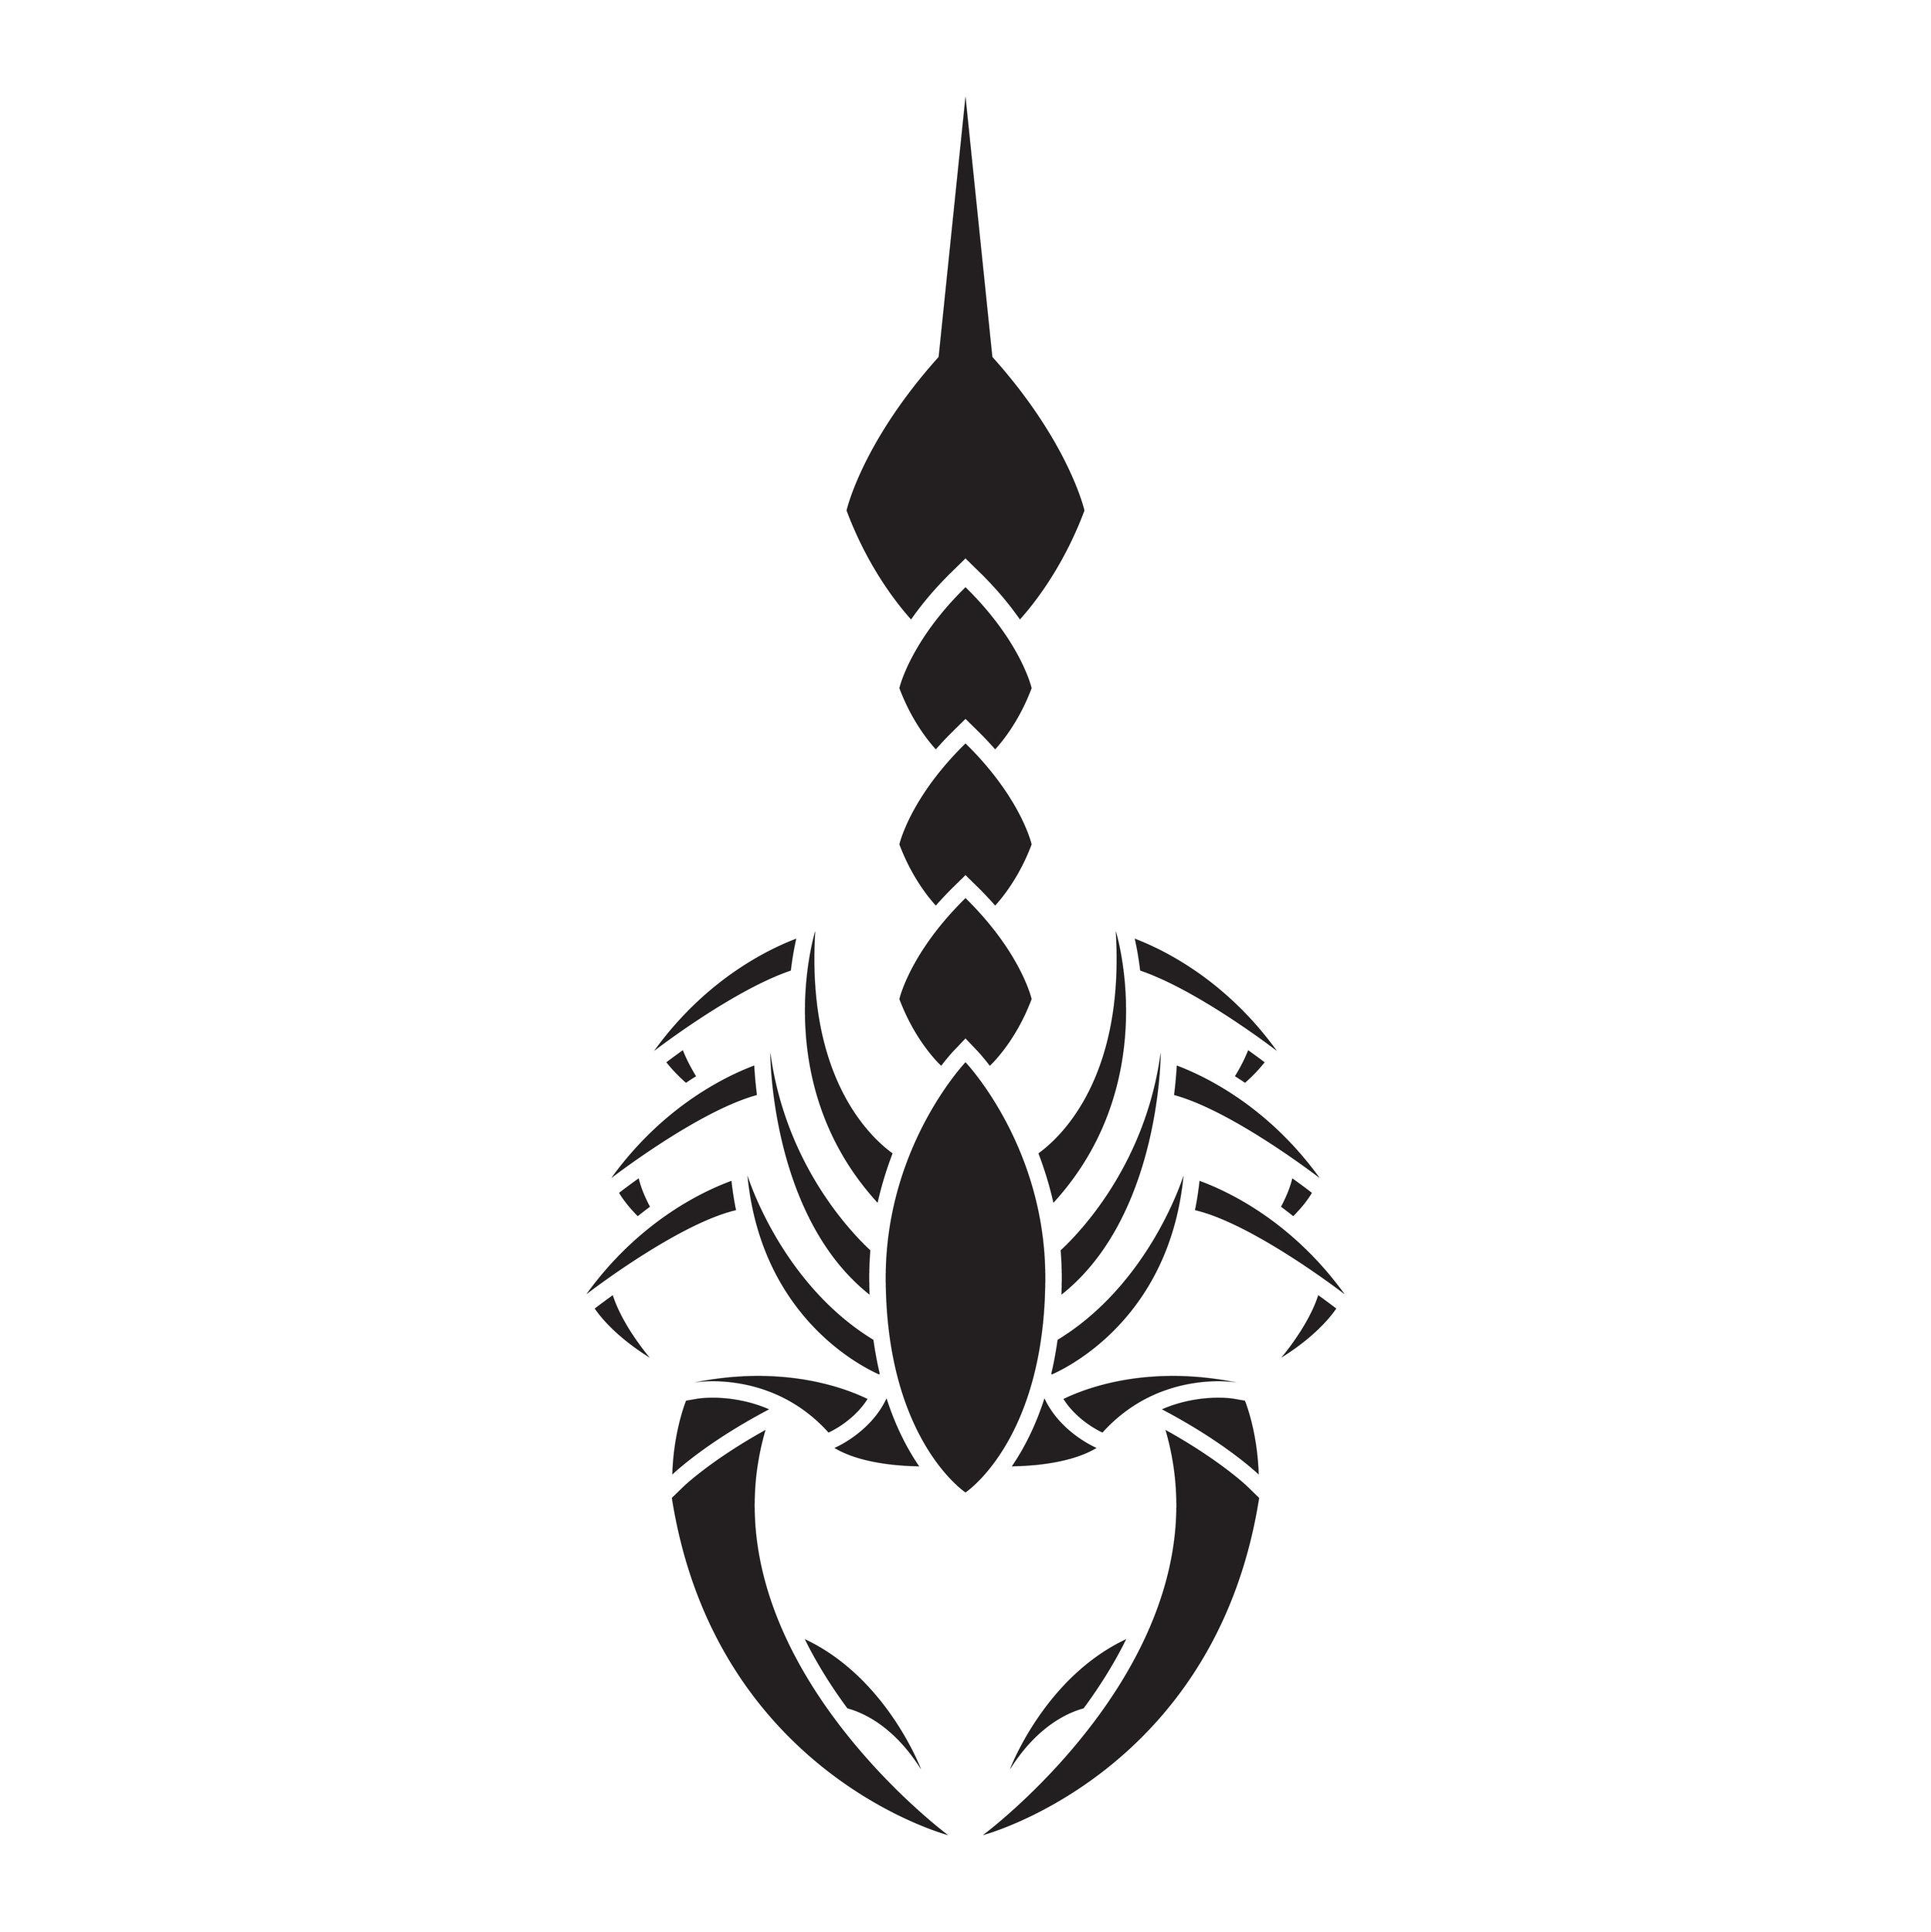 Scorpon_tat-01.jpg